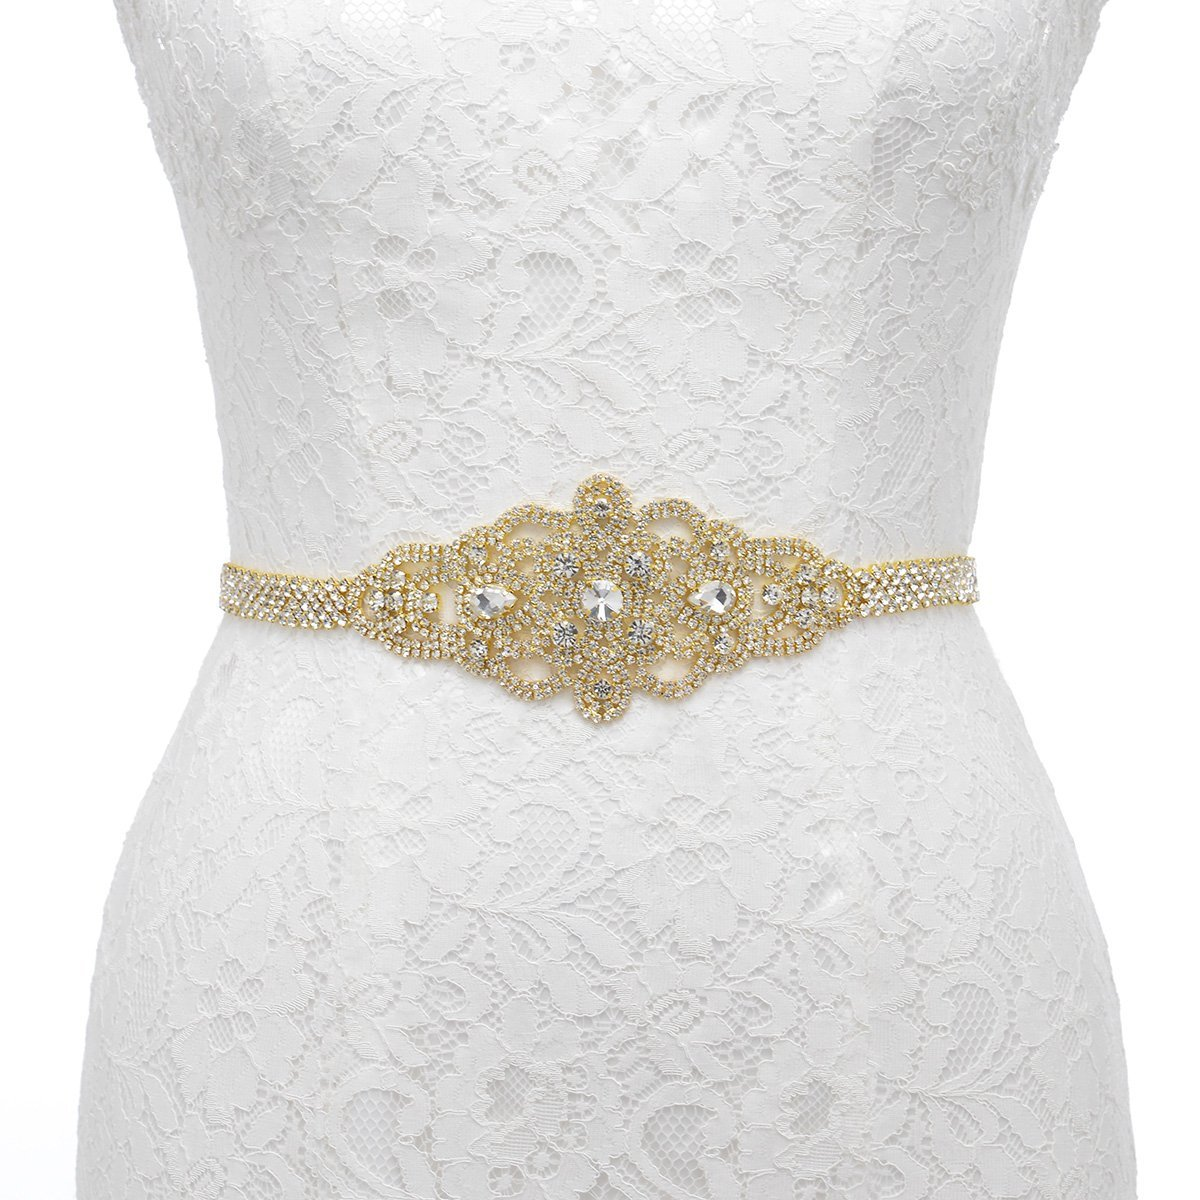 Amazon.com: Remedios Satin Sash with Linear Beaded Design ...